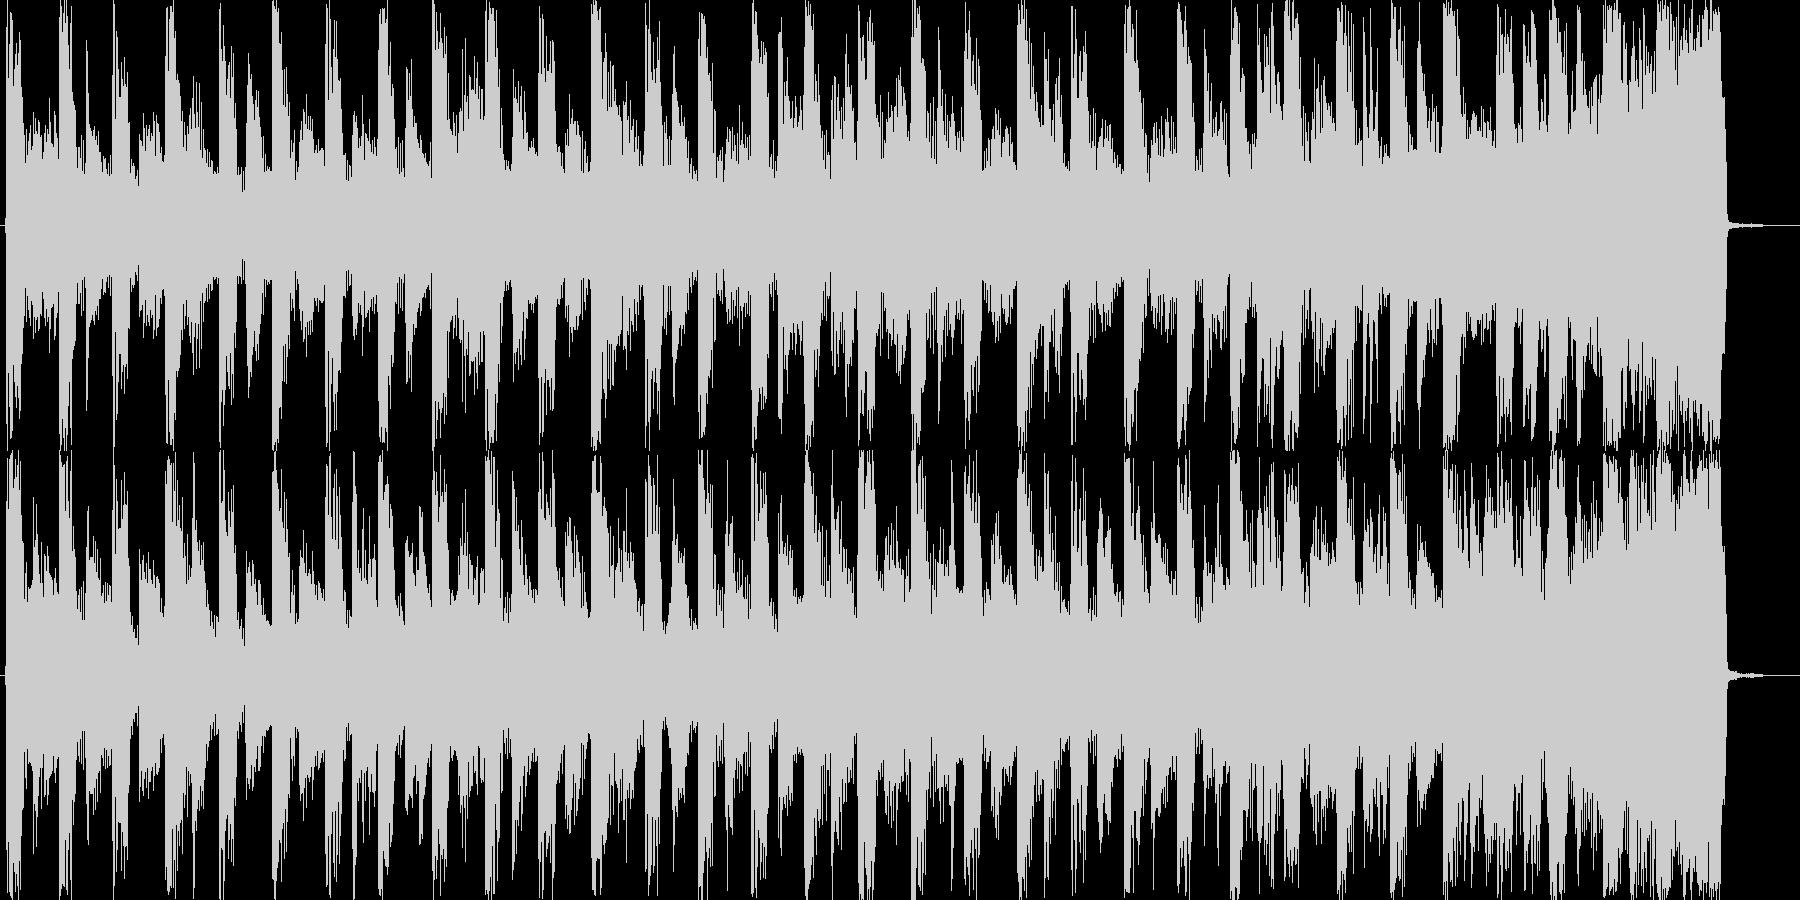 TV番組のオープニングを想定した楽曲で…の未再生の波形